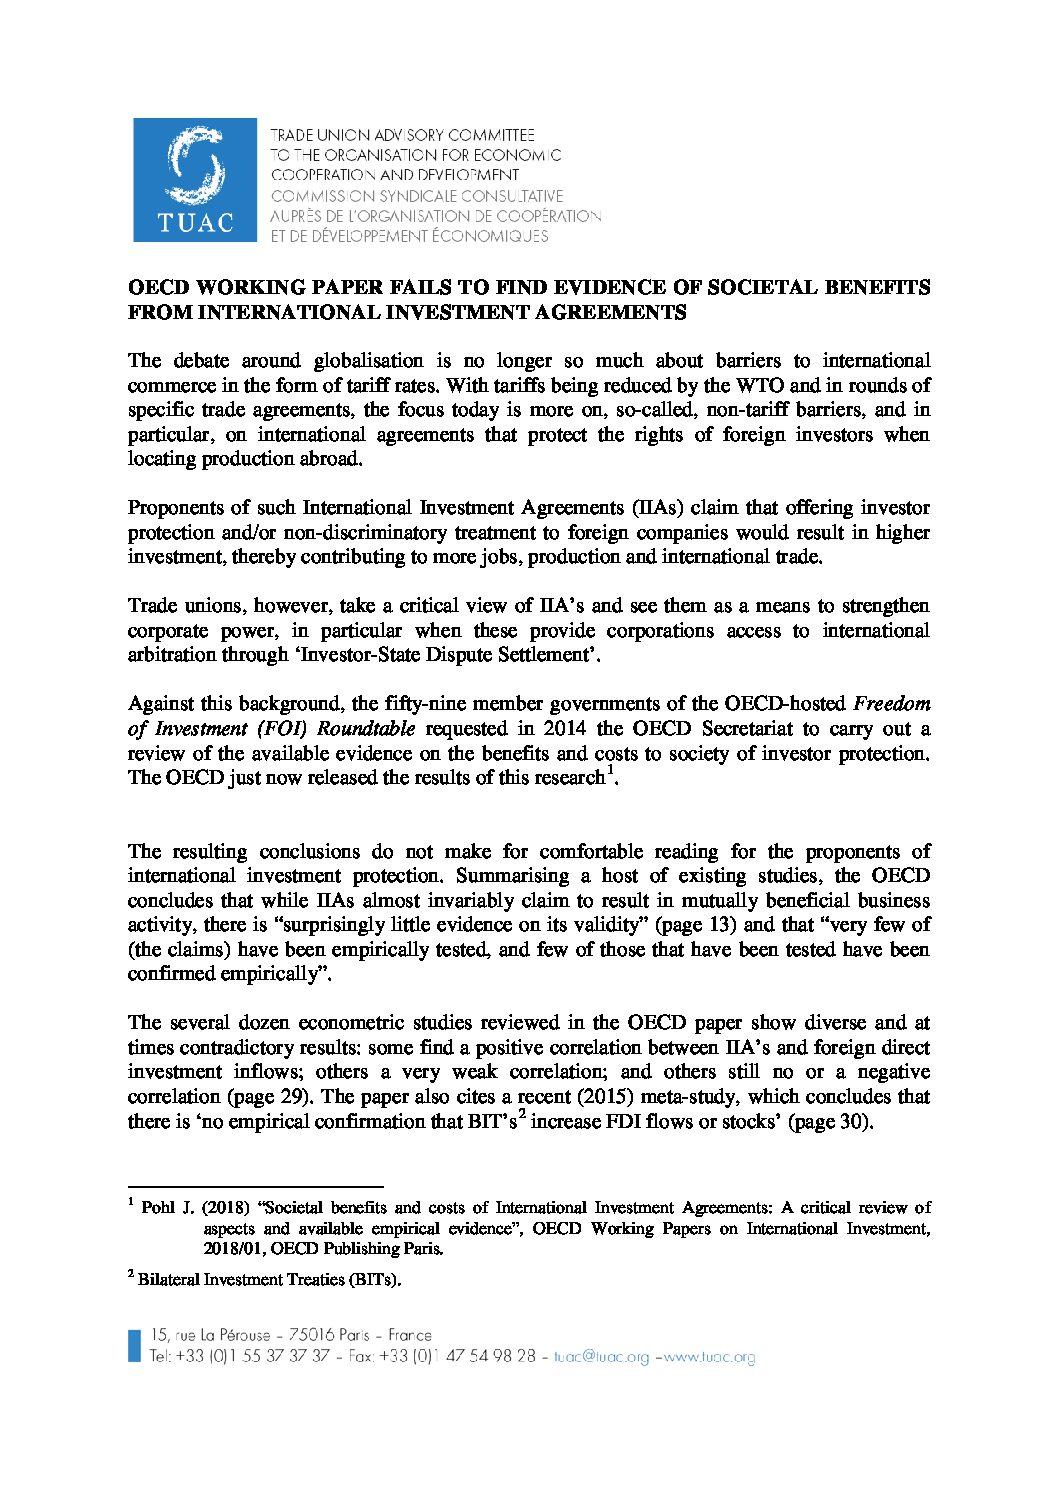 TUAC note on IIA's final pdf